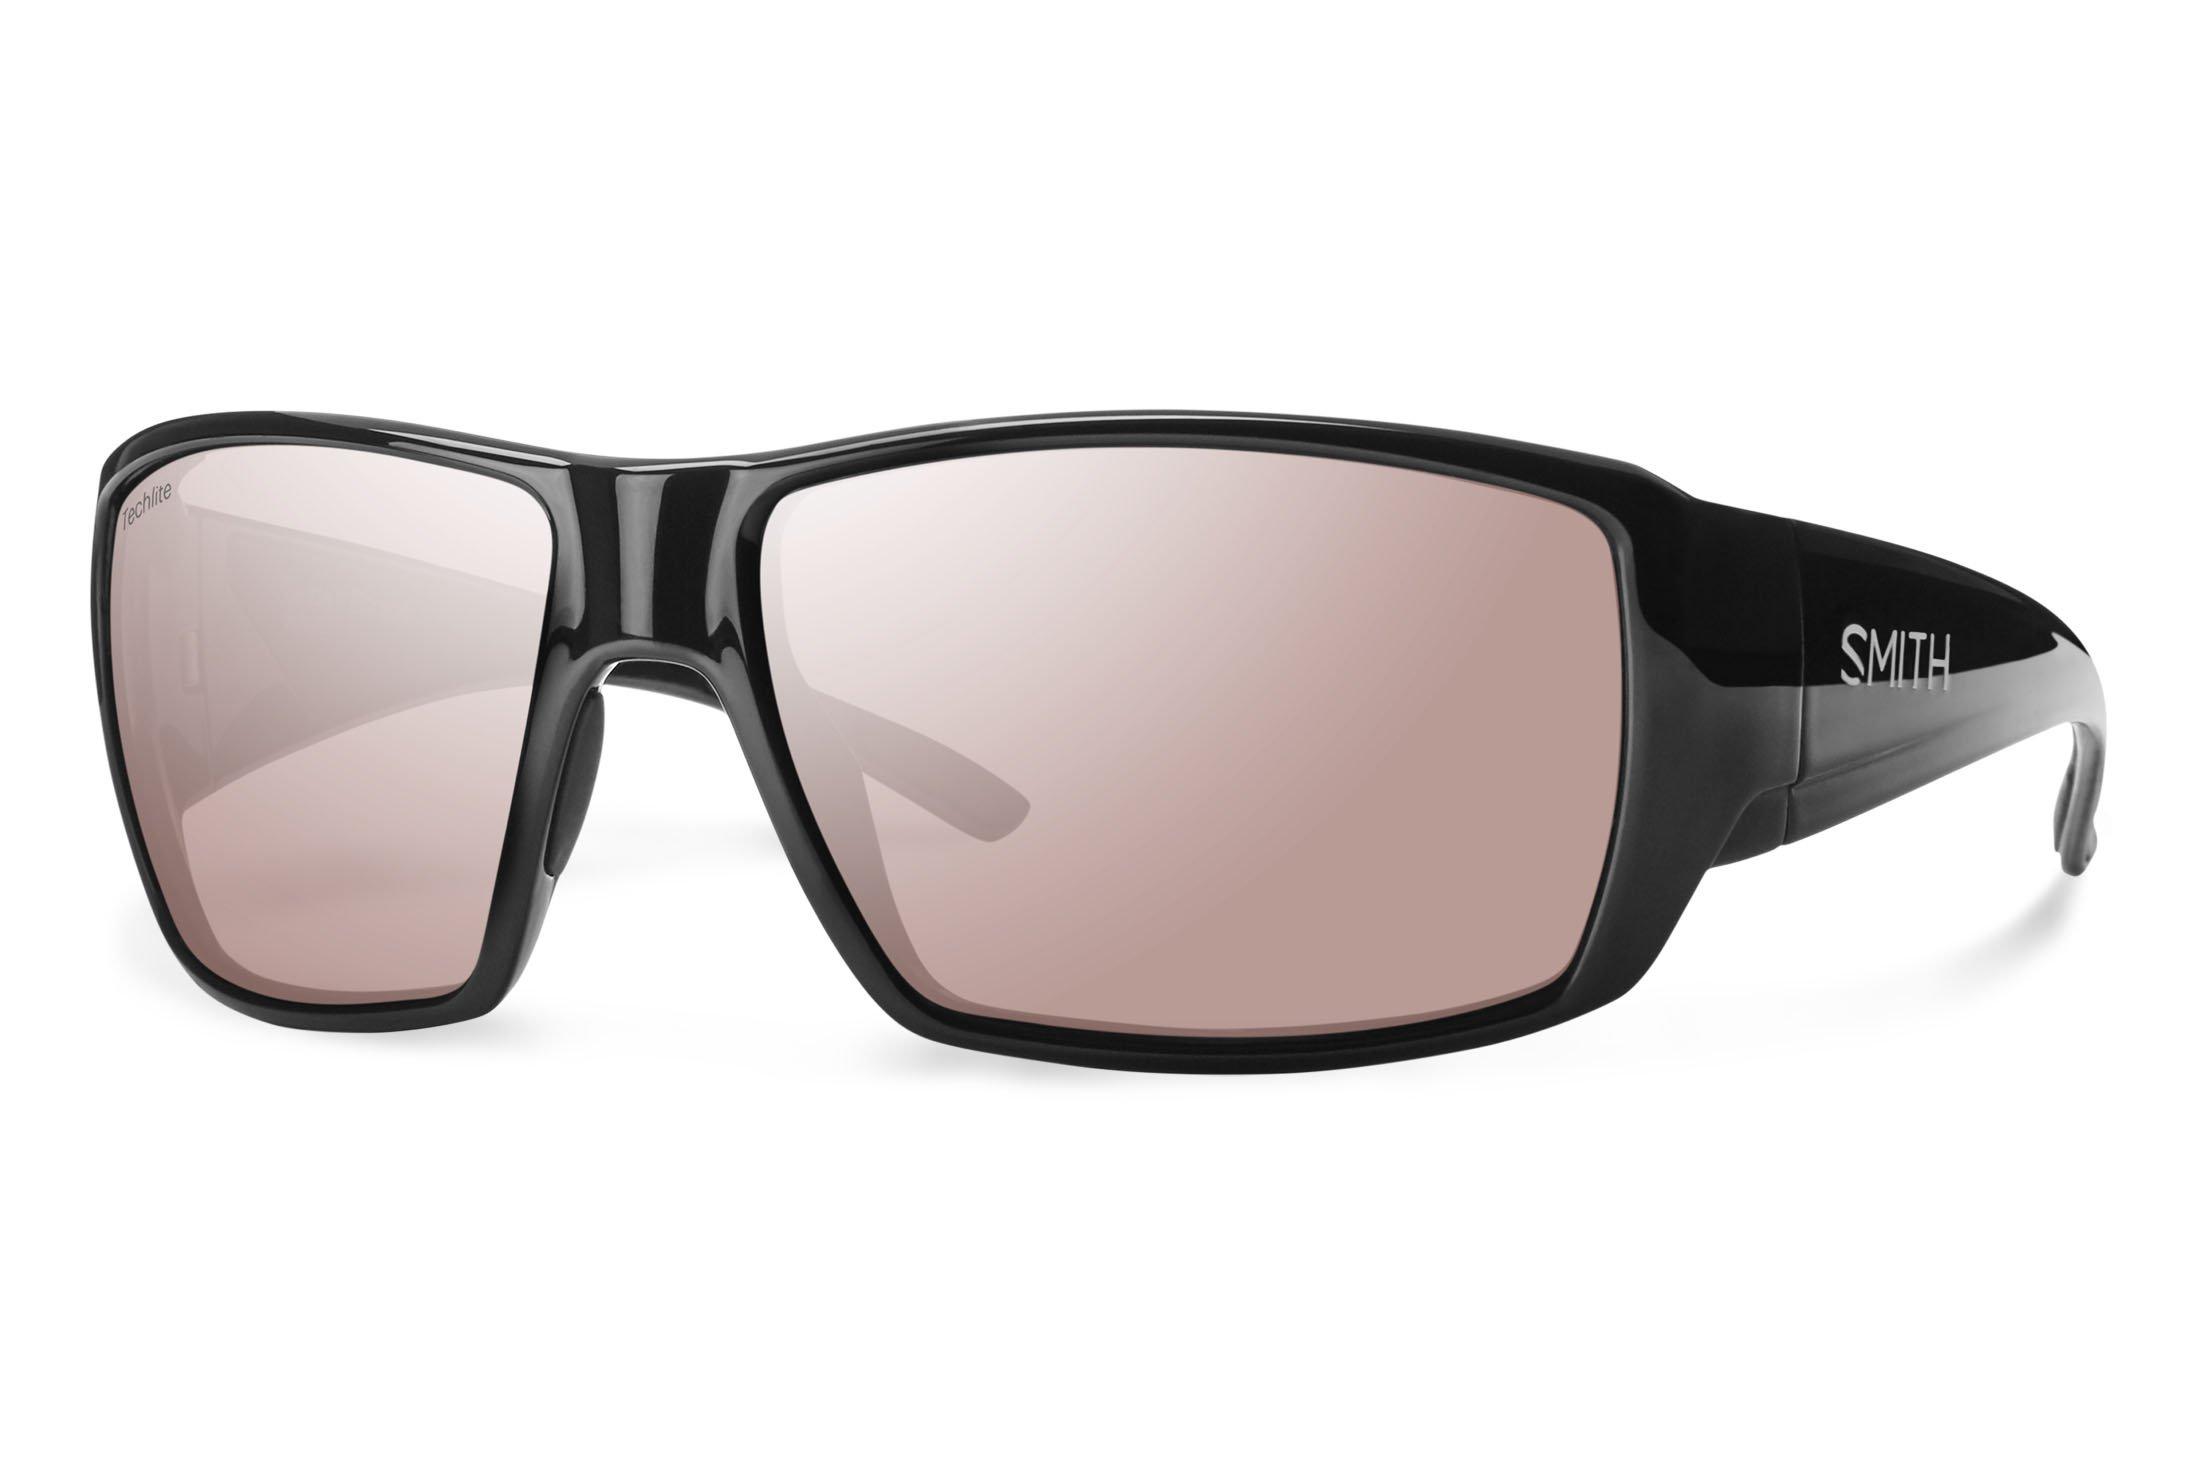 Smith Optics Guides Choice Sunglasses, Black Frame, Polarchromic Ignitor Techlite Glass Lenses